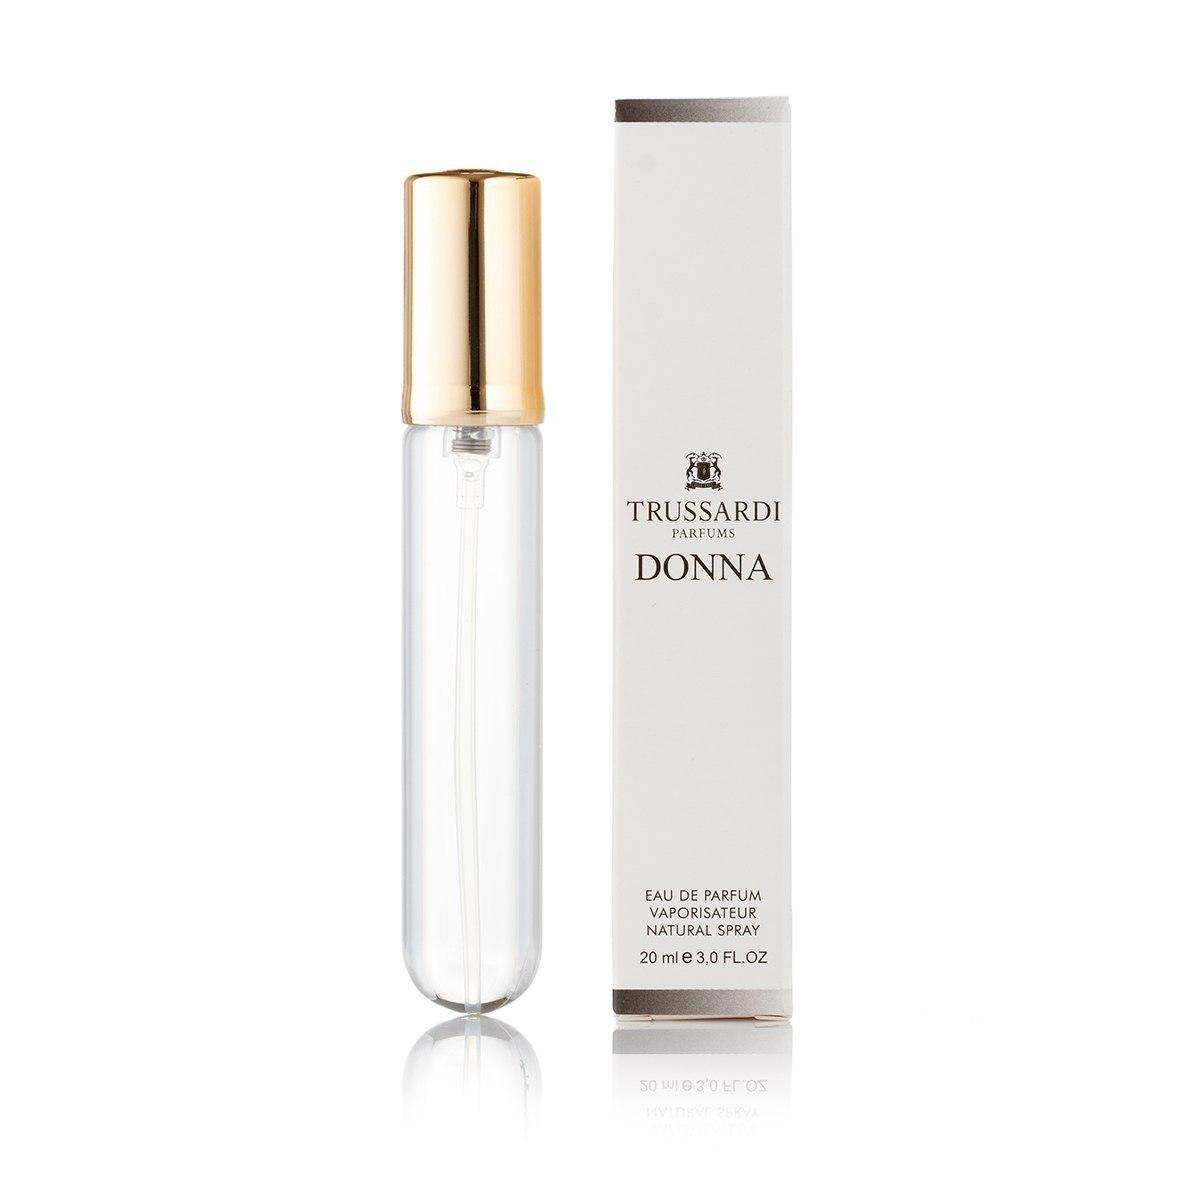 20 мл міні-парфуми Donna Trussardi (ж)